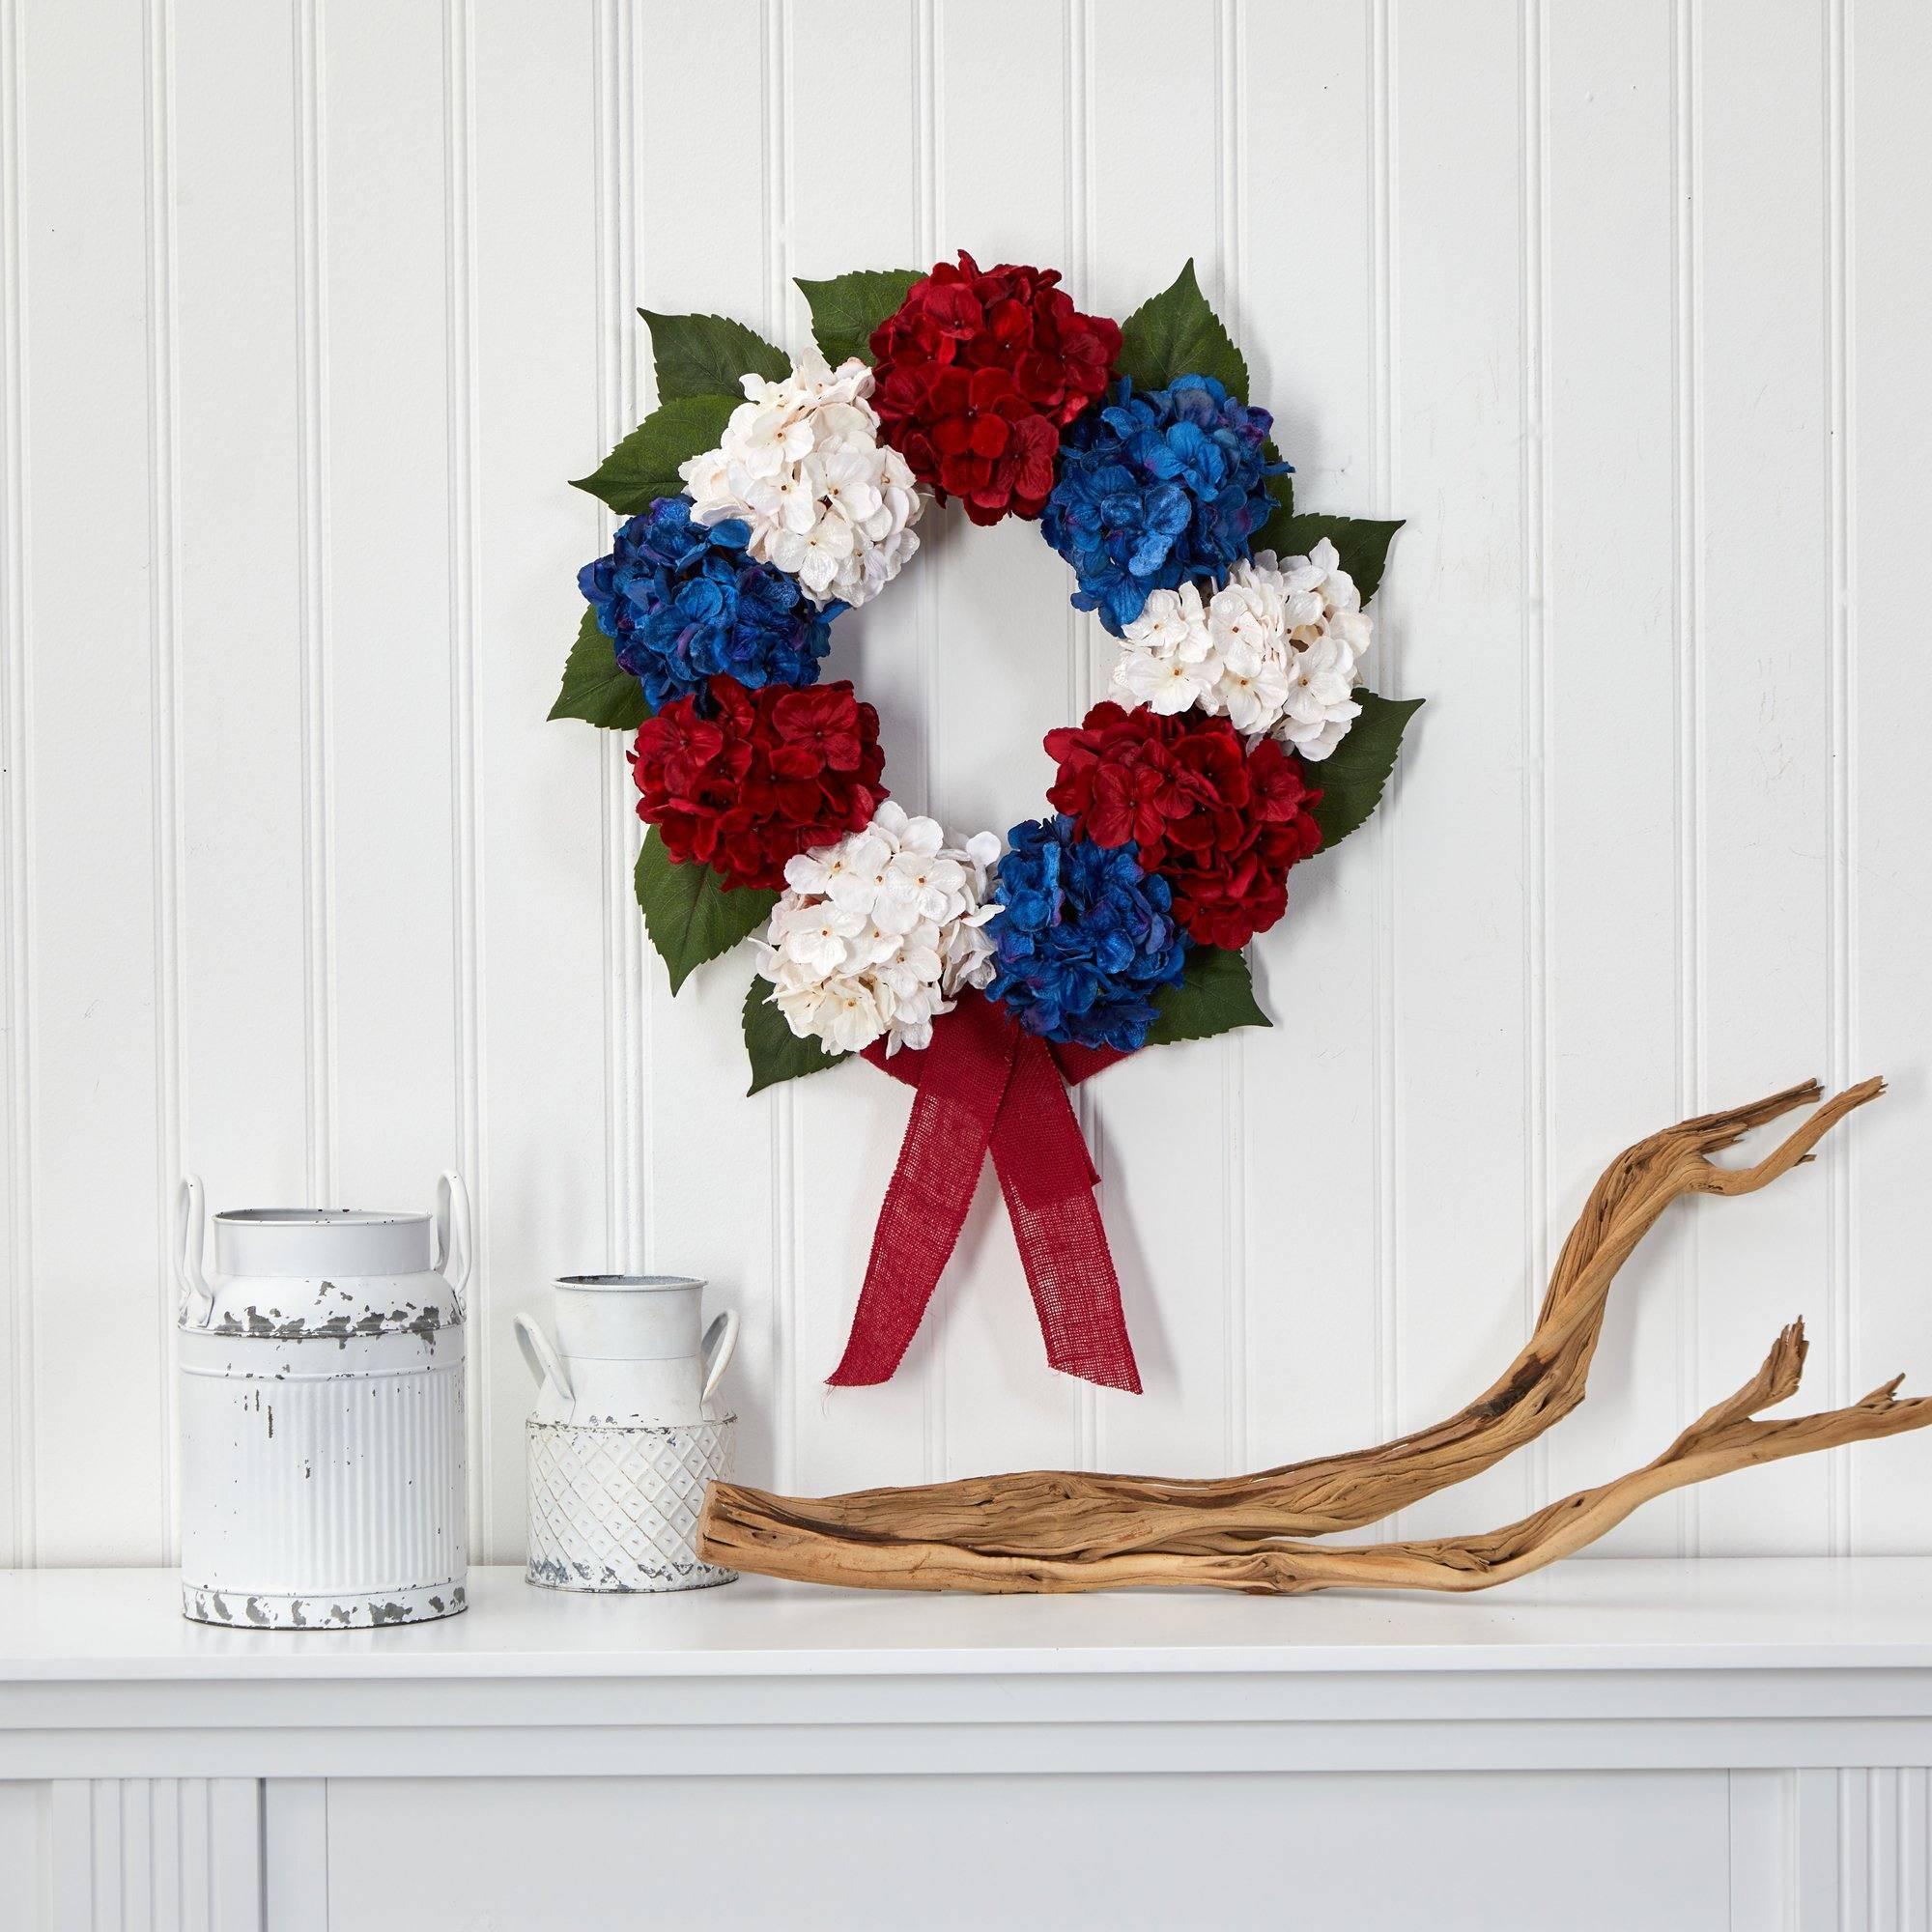 A 4th of July wreath